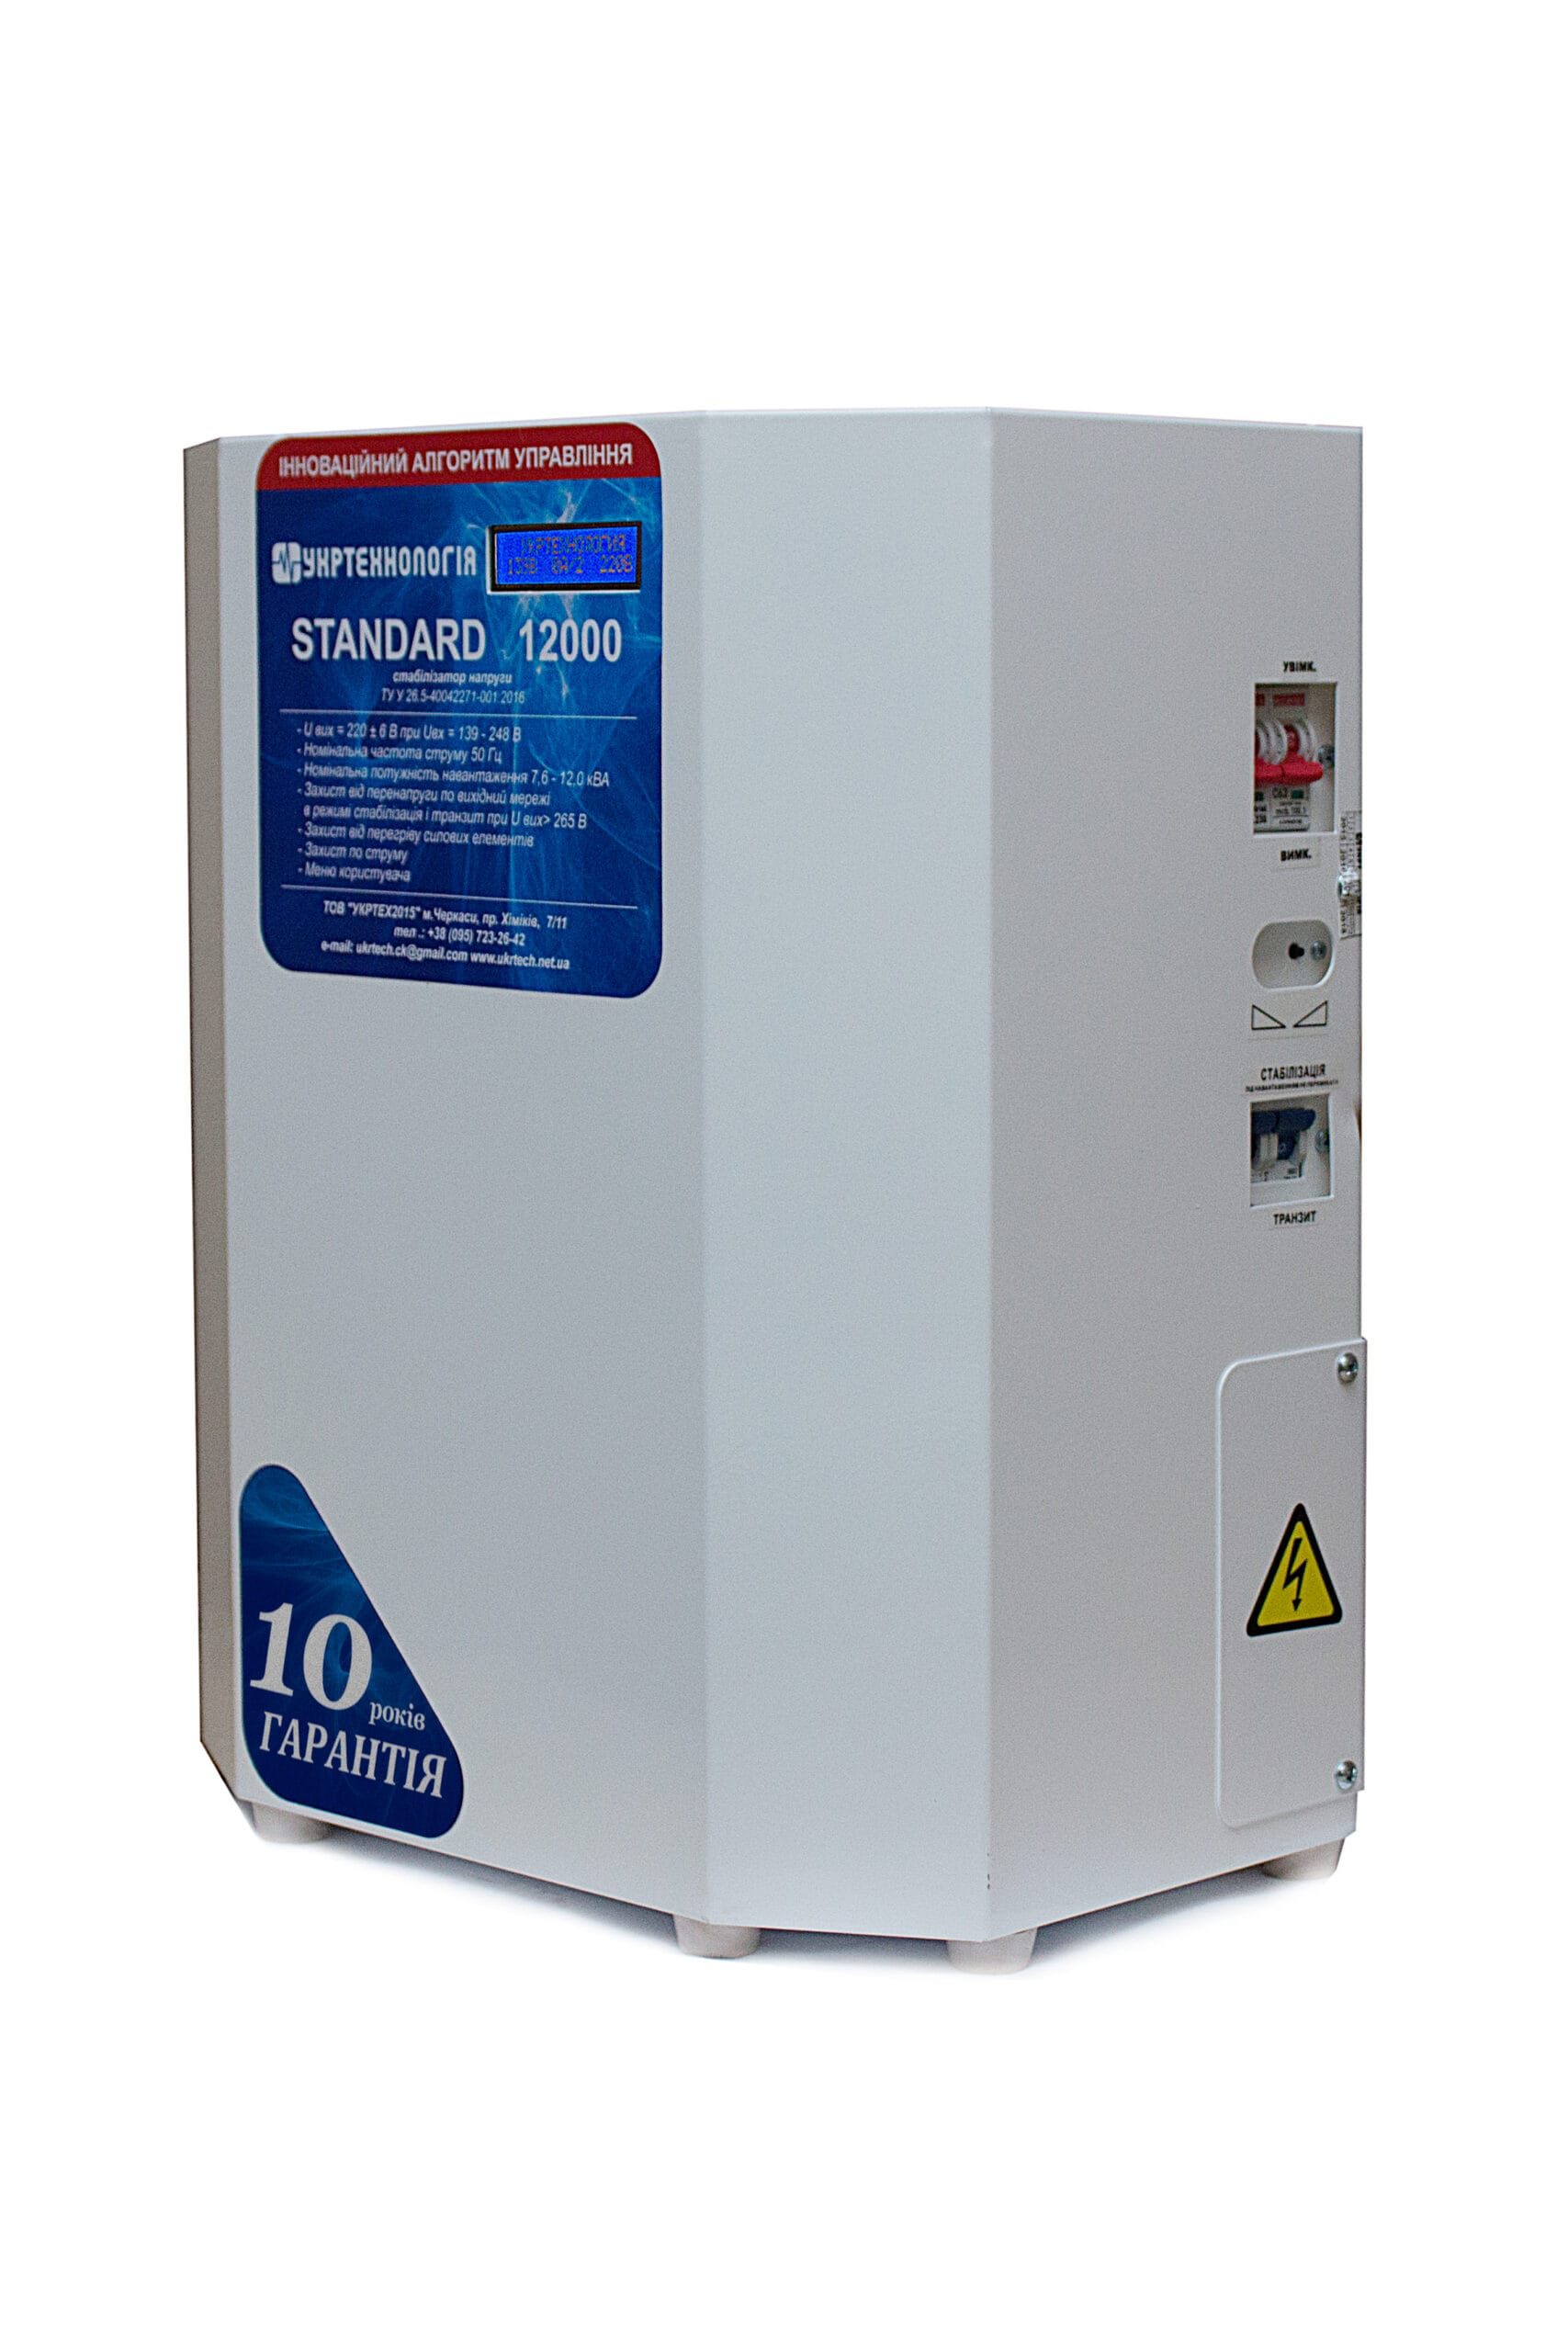 Стабилизаторы напряжения - Стабилизатор напряжения 12 кВт STANDARD  000001399 - Фото 1